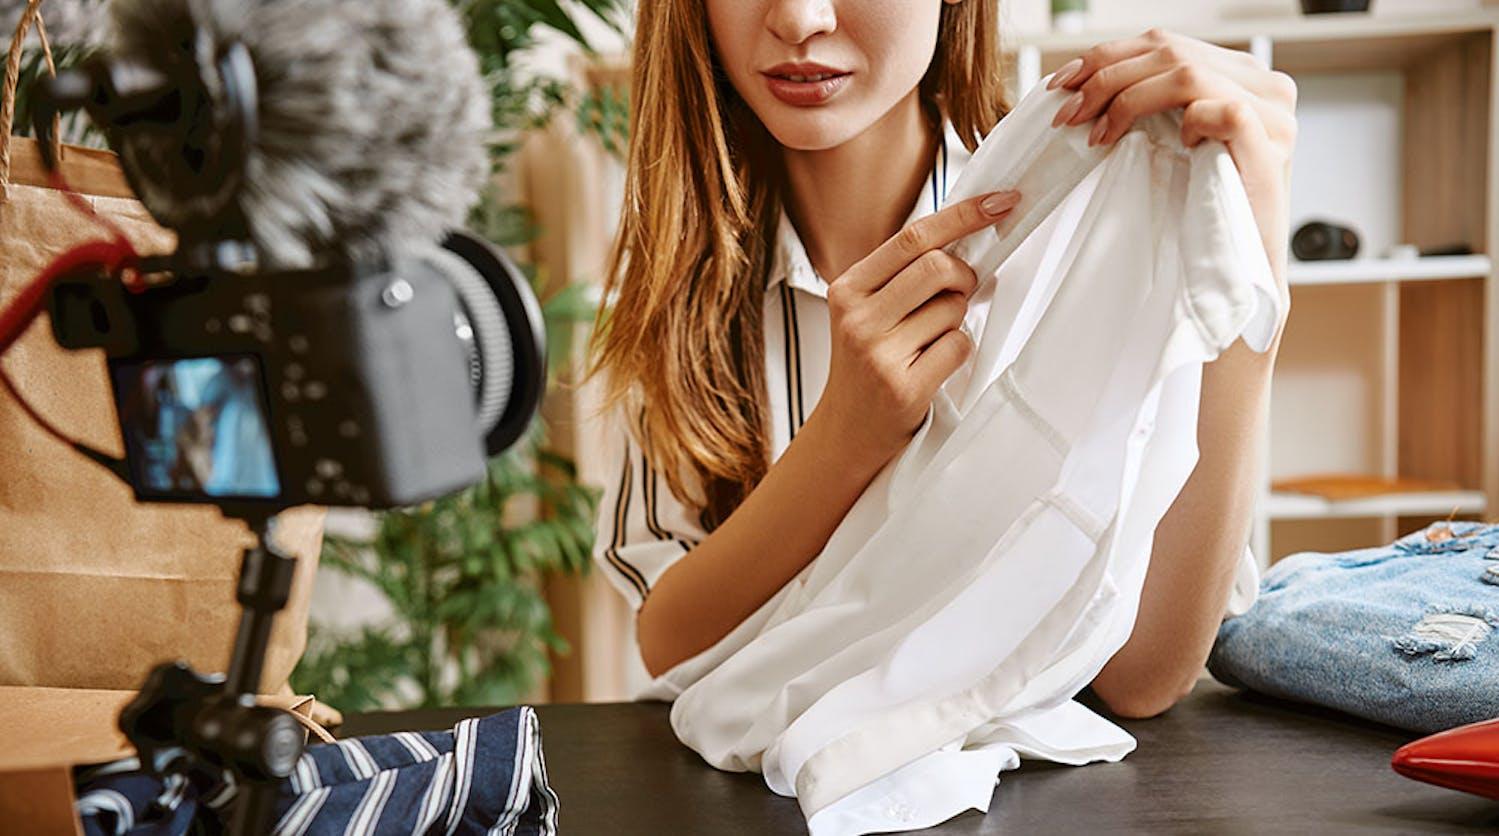 Decorative: student filming garment